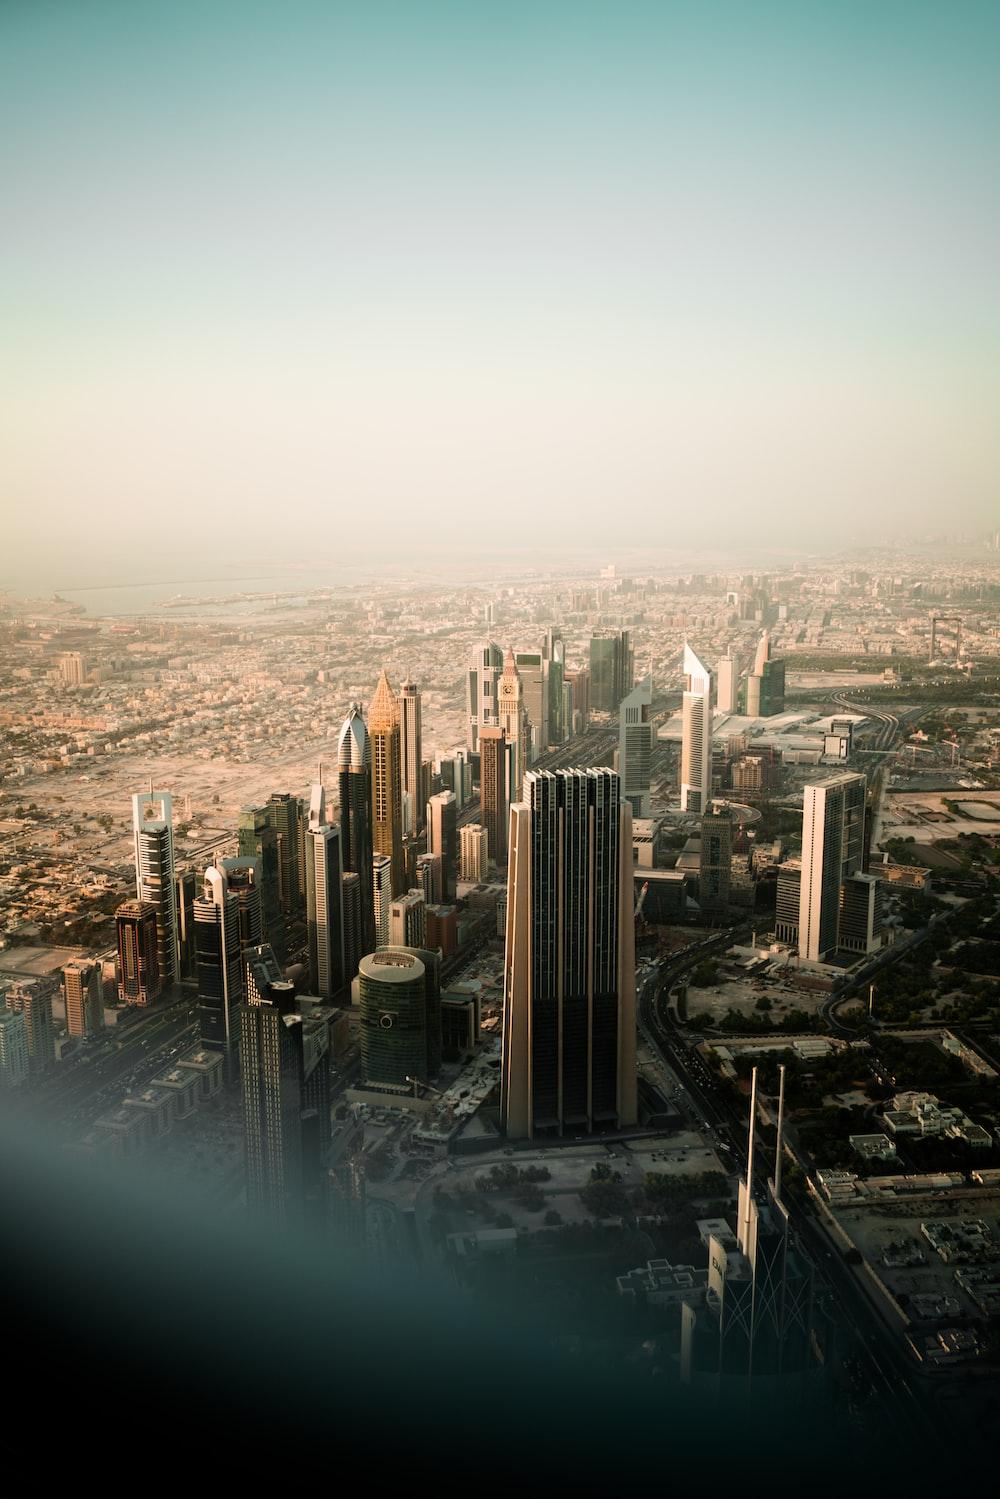 100 Burj Khalifa Pictures Download Free Images On Unsplash